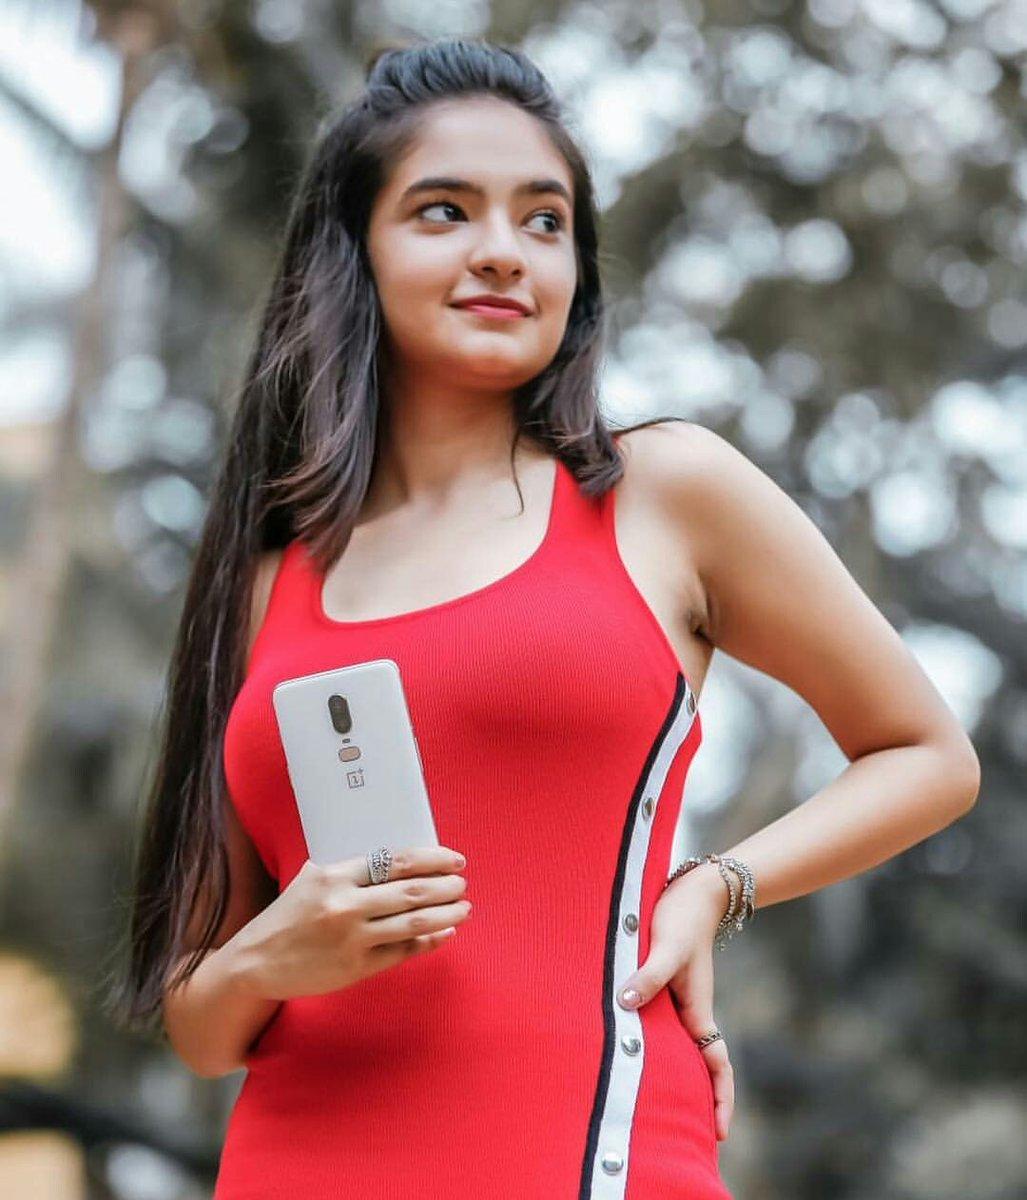 Anushka Sen, Rani Laxmibai, Manikarnika, Chandrakanta, Jyotir Ji, Baal Veer, Indian television show, Indian TV shows, Bollywood news, Entertainment news